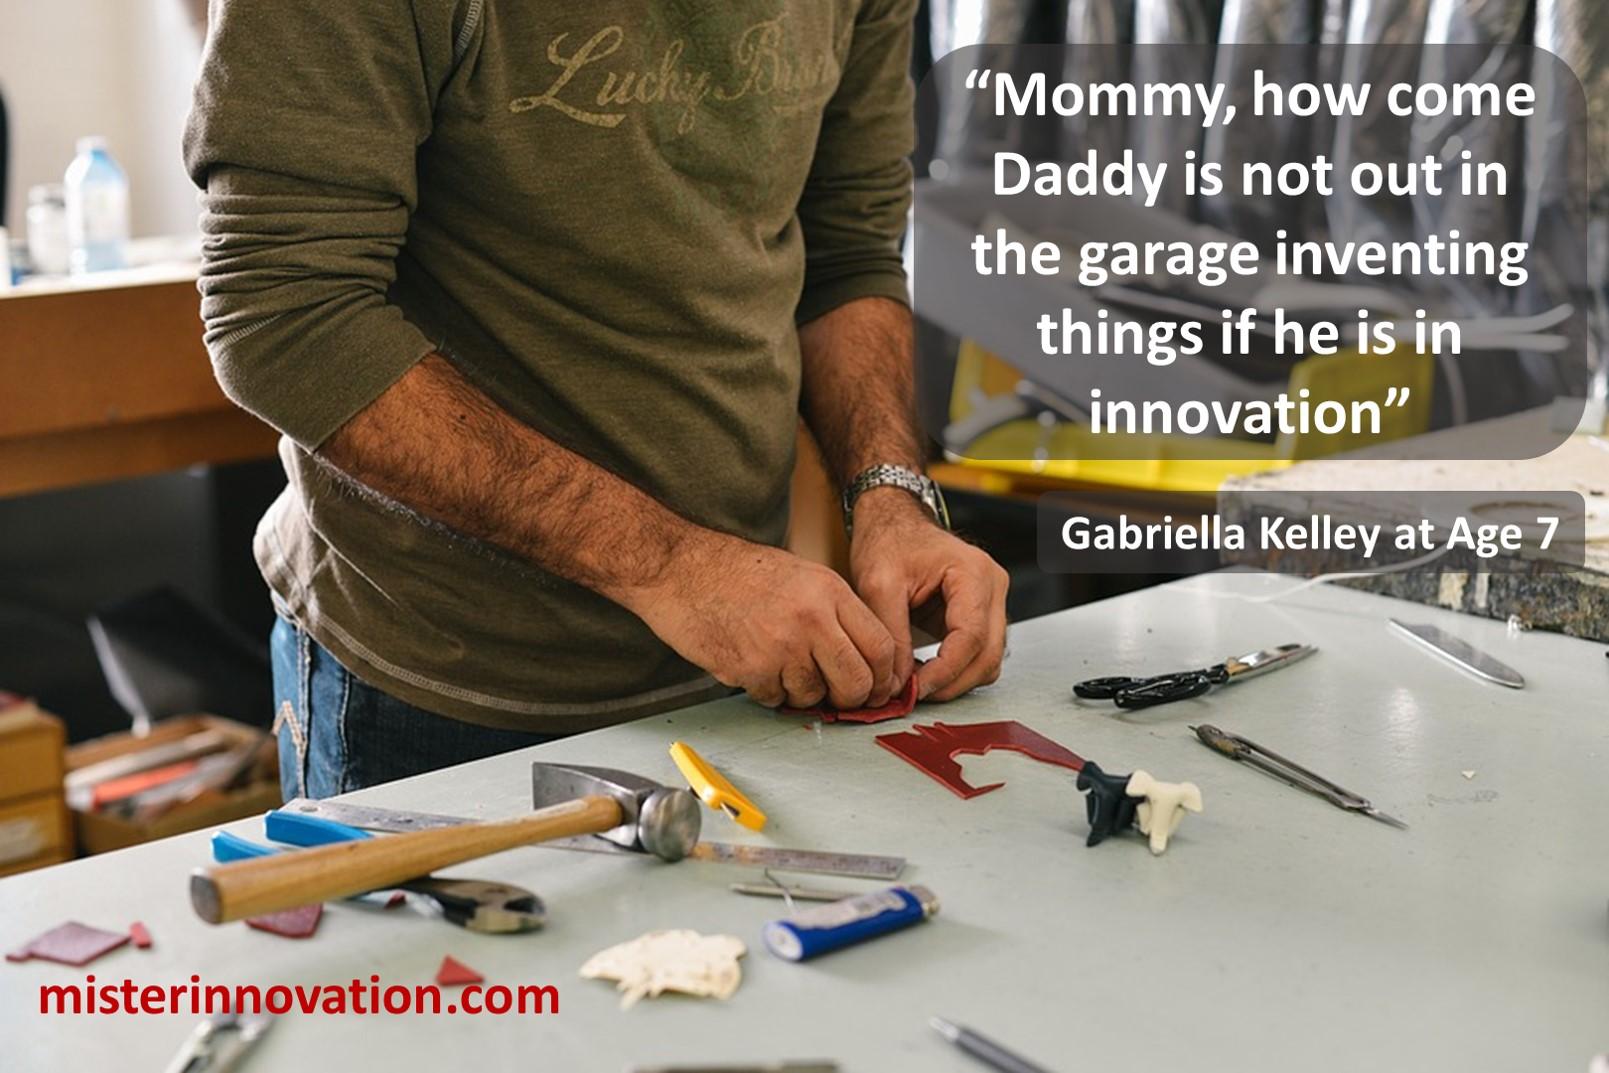 Gabriella Kelley Garage Invention vs Innovation